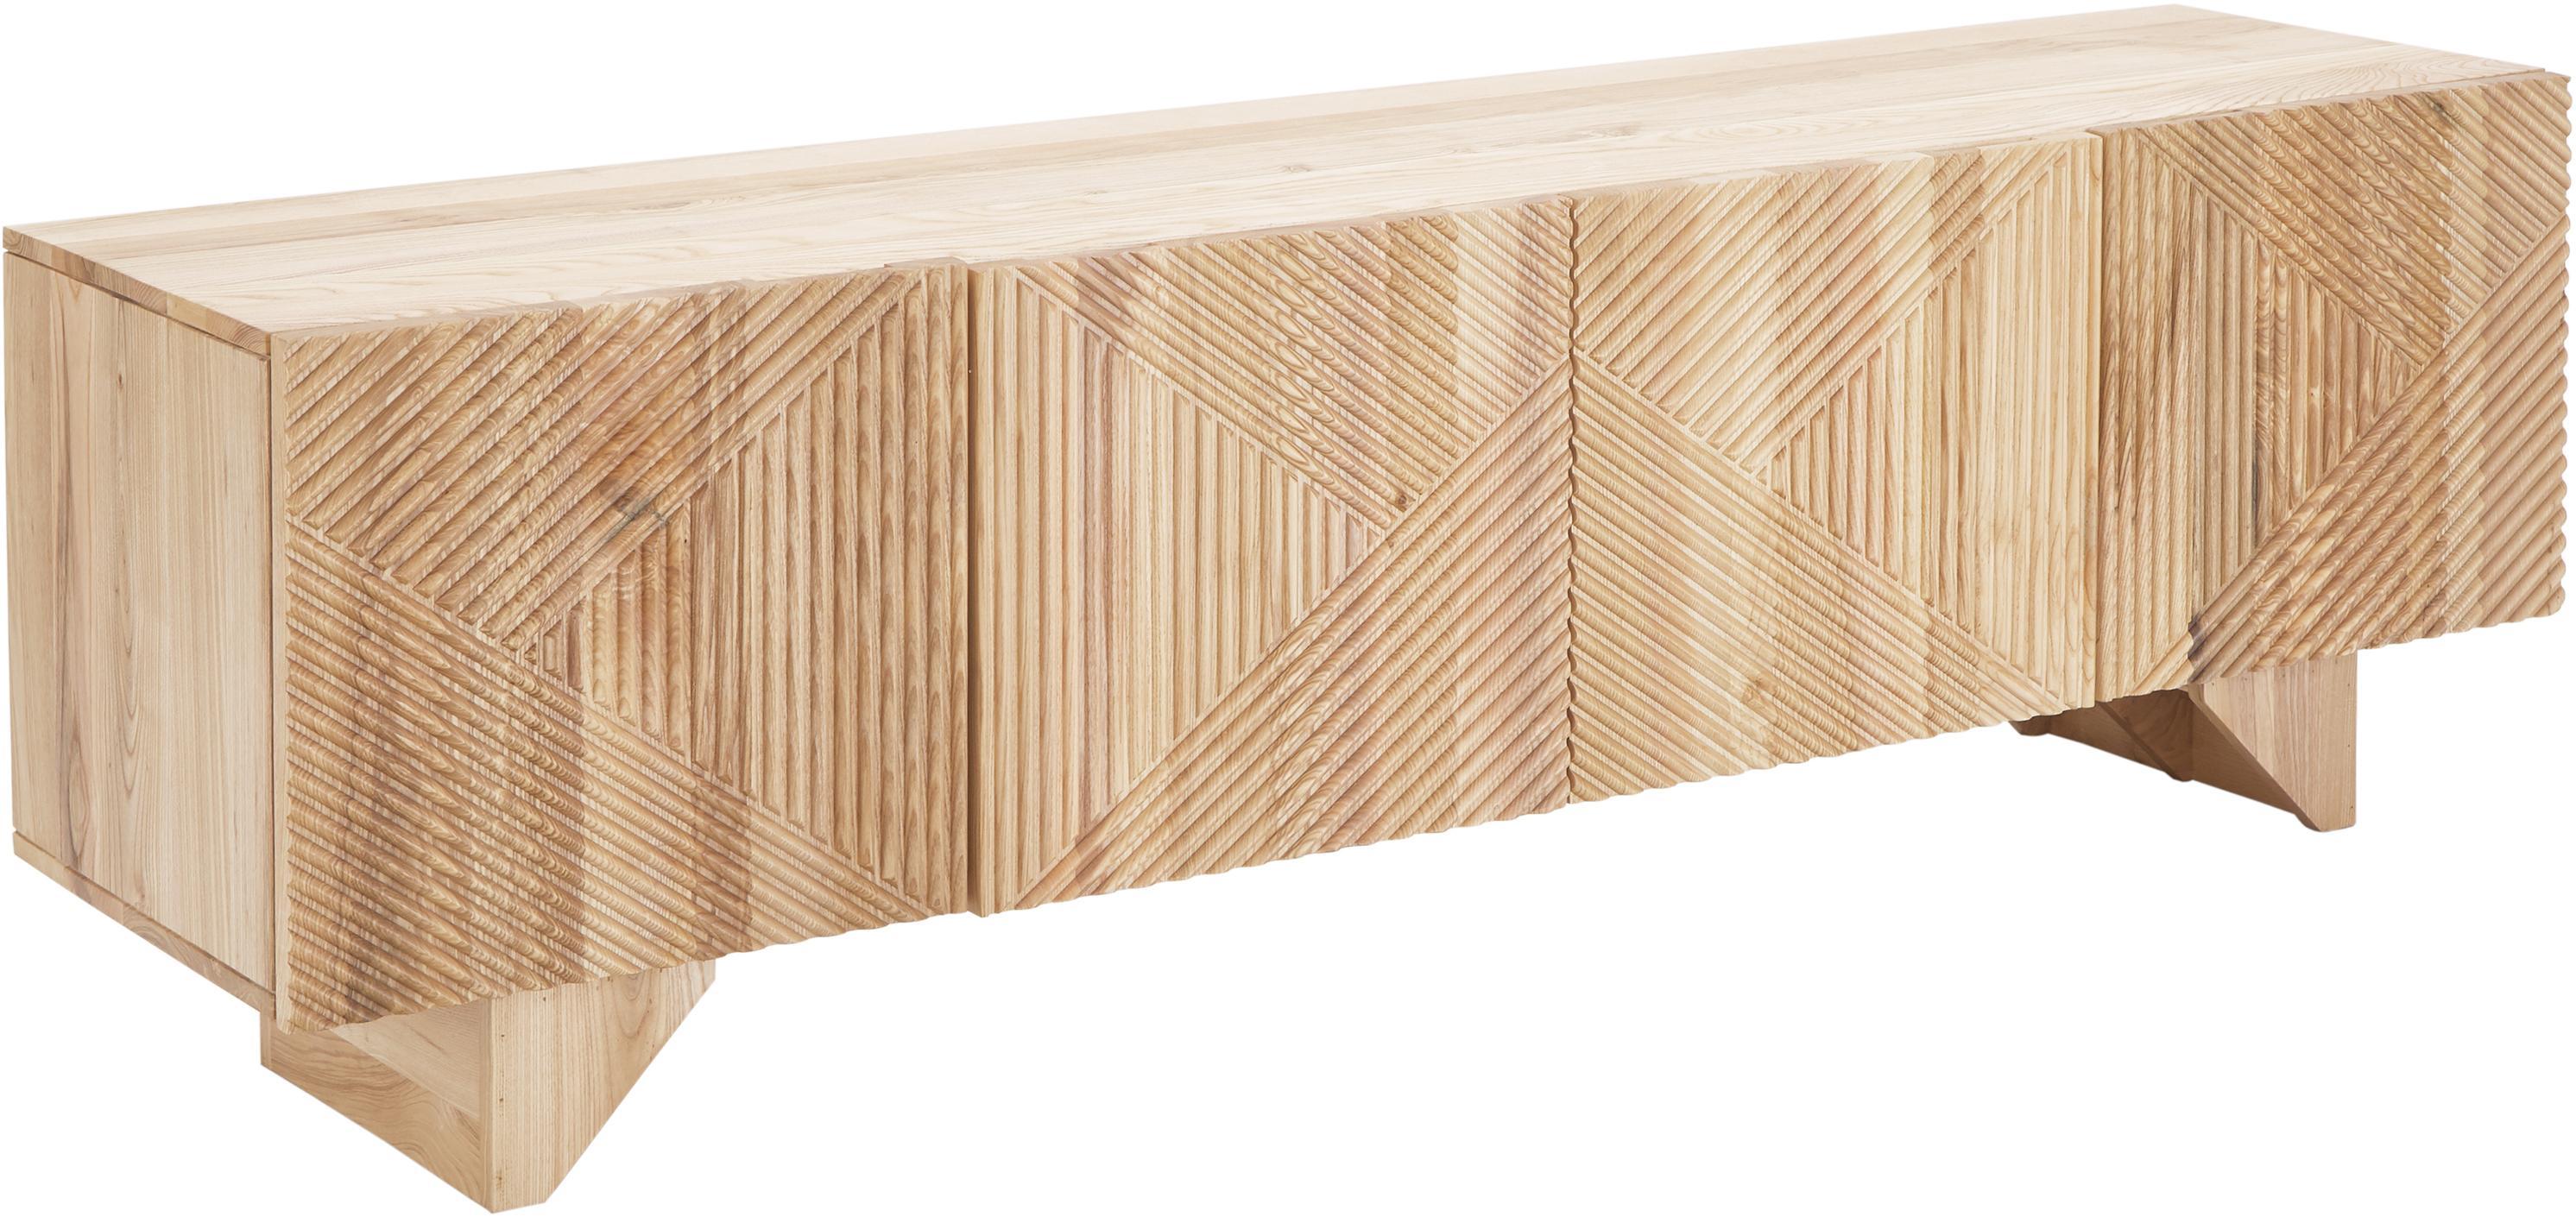 Lowboard Louis aus Massivholz, Massives Eschenholz, lackiert, Eschenholz, 180 x 55 cm